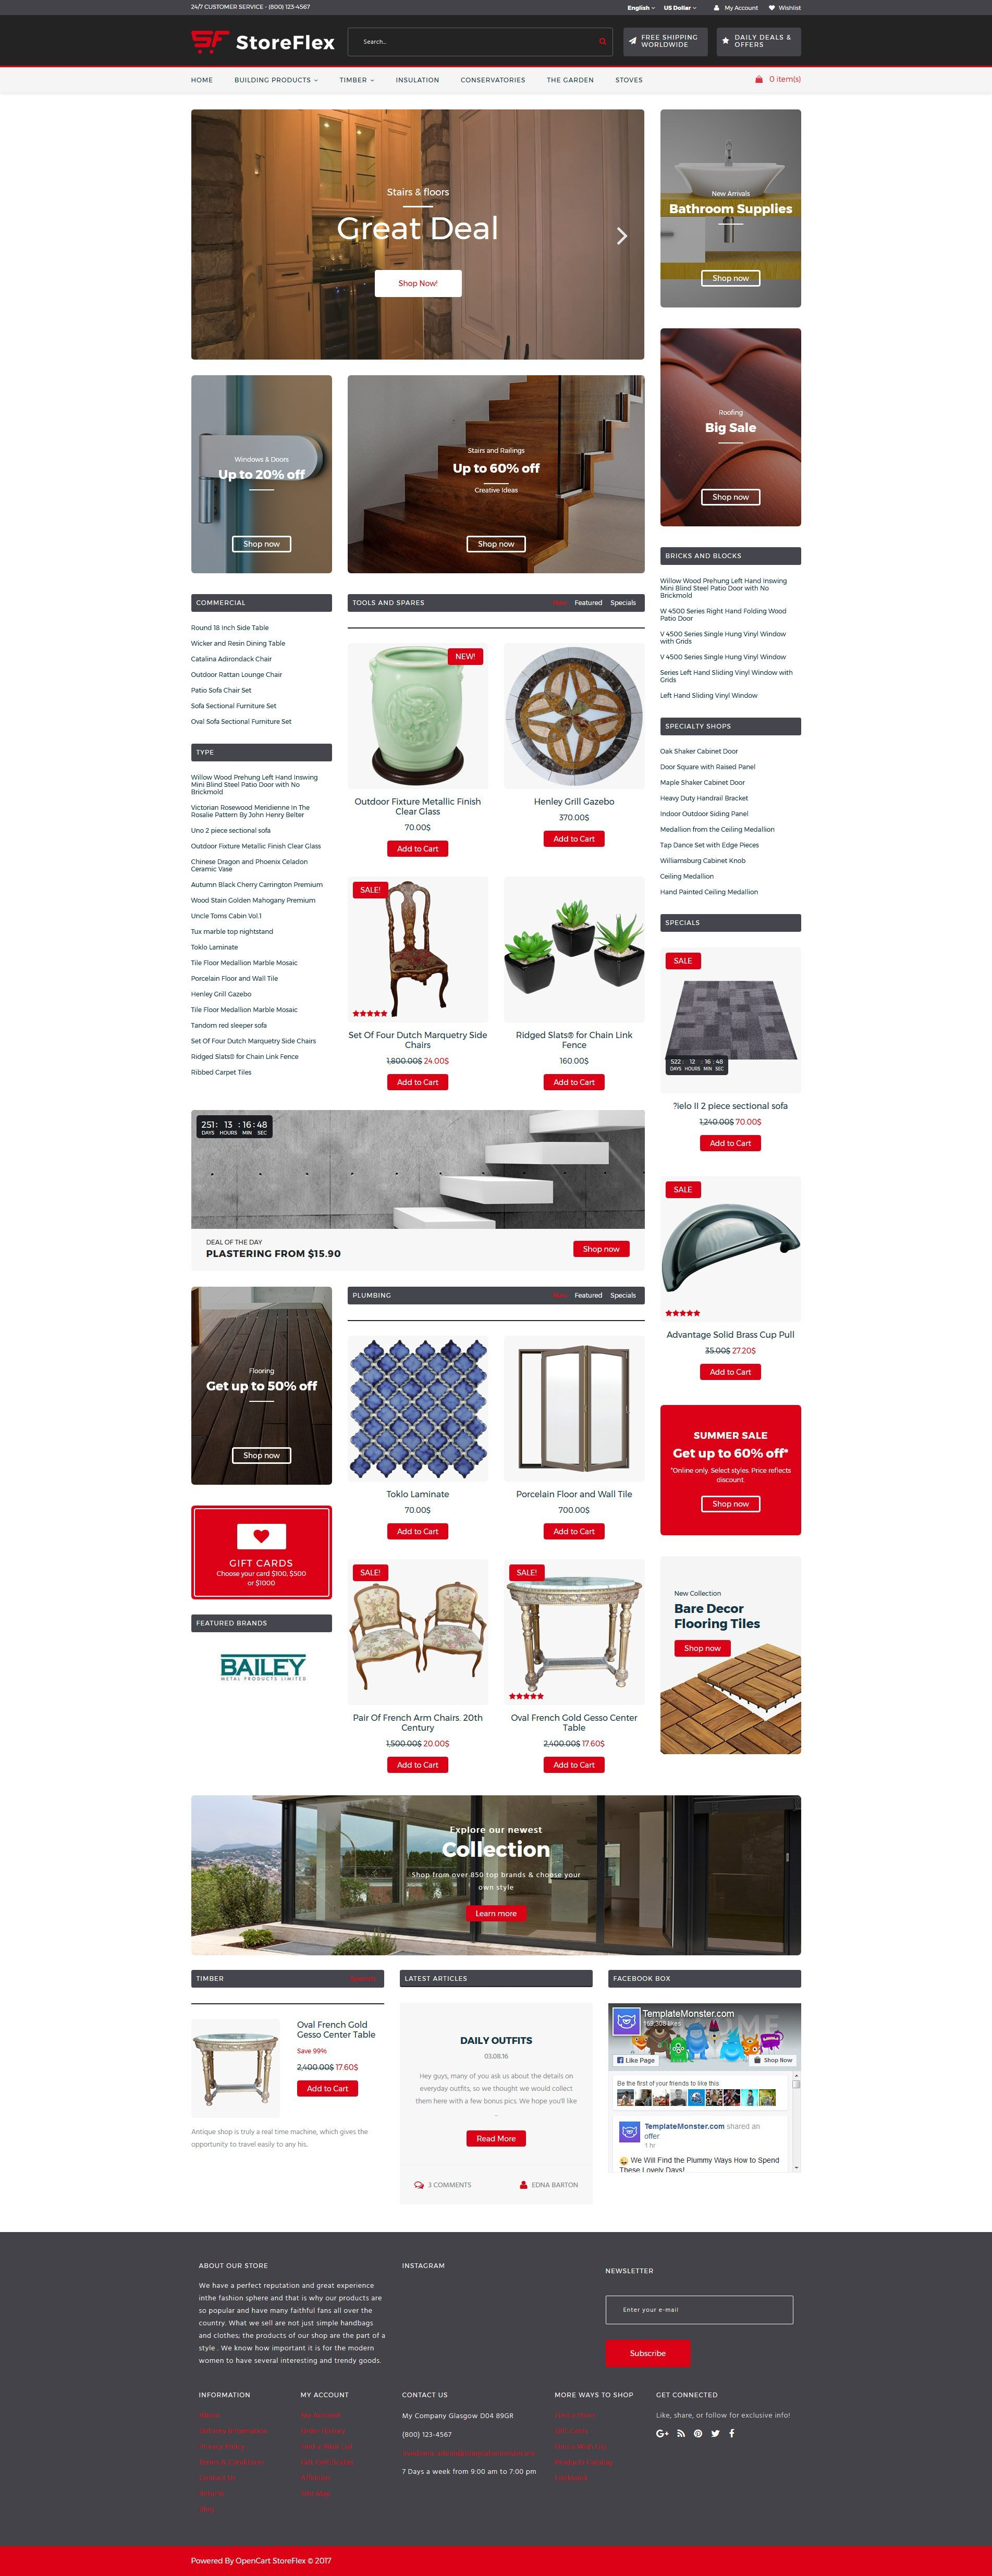 """StoreFlex - Building Materials Responsive"" - адаптивний OpenCart шаблон №63567 - скріншот"